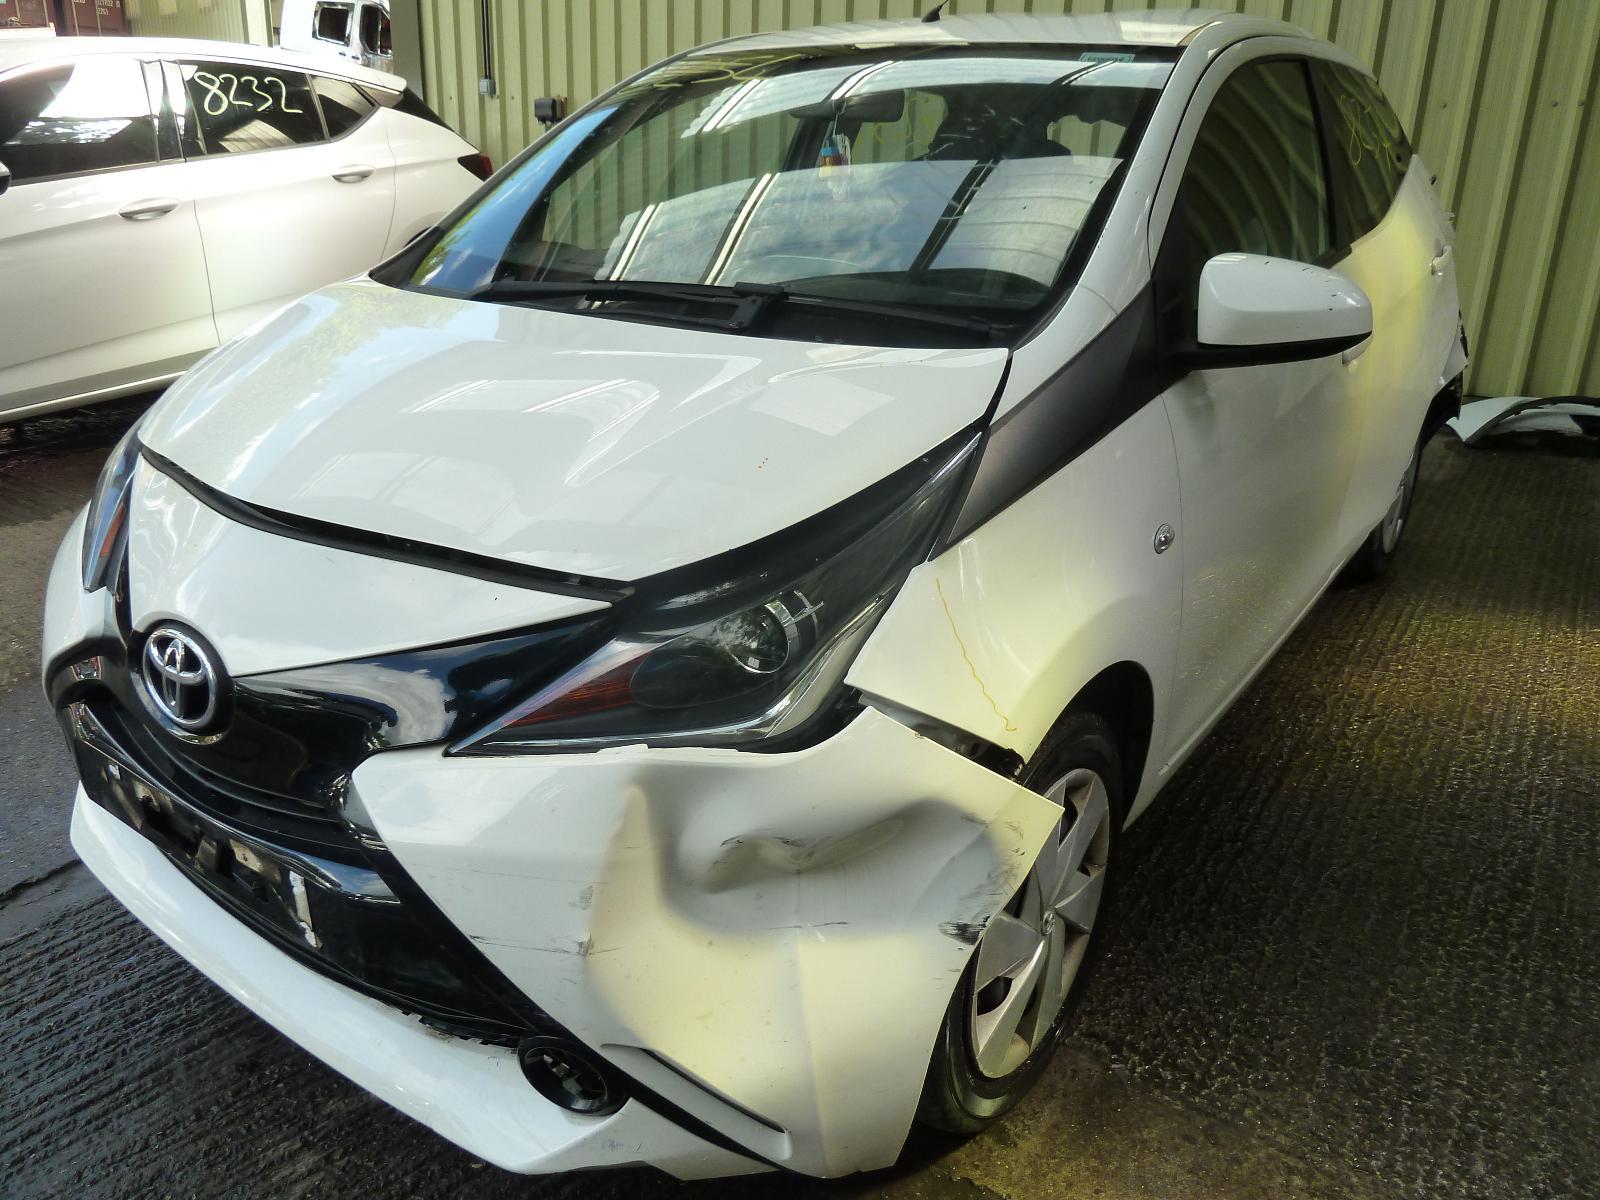 Image for a TOYOTA AYGO 2015 5 Door Hatchback